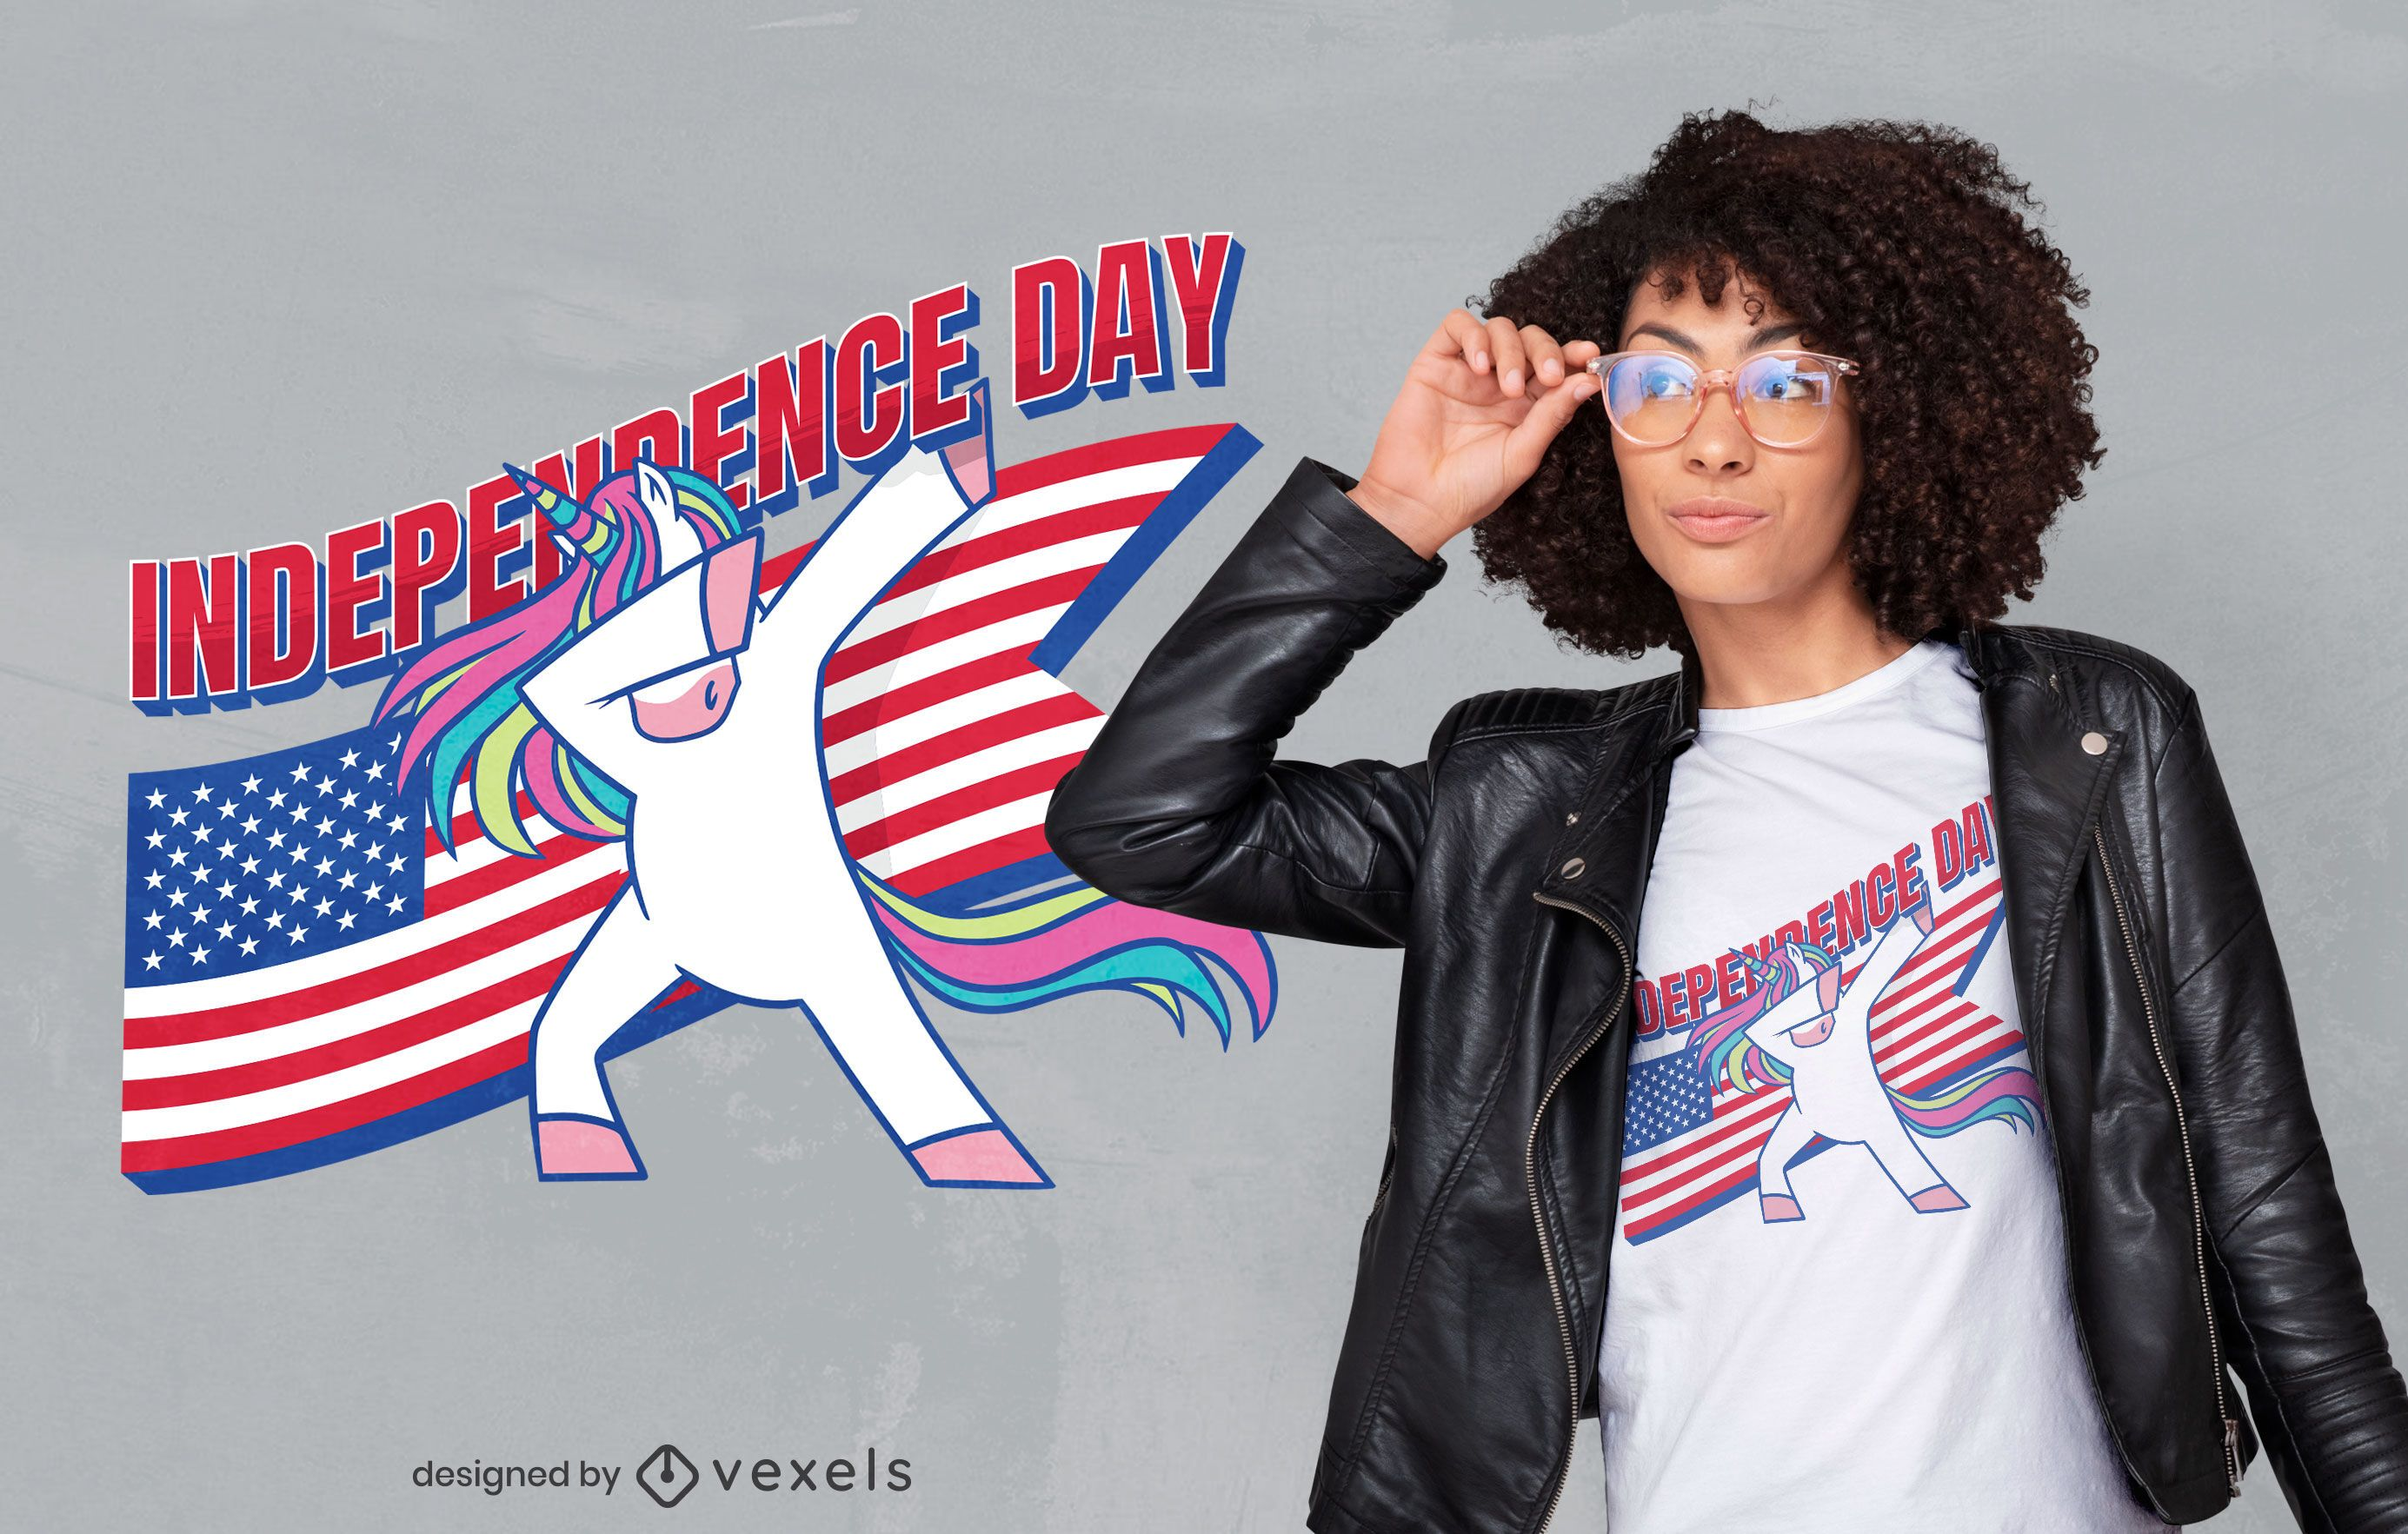 Independence day unicorn t-shirt design